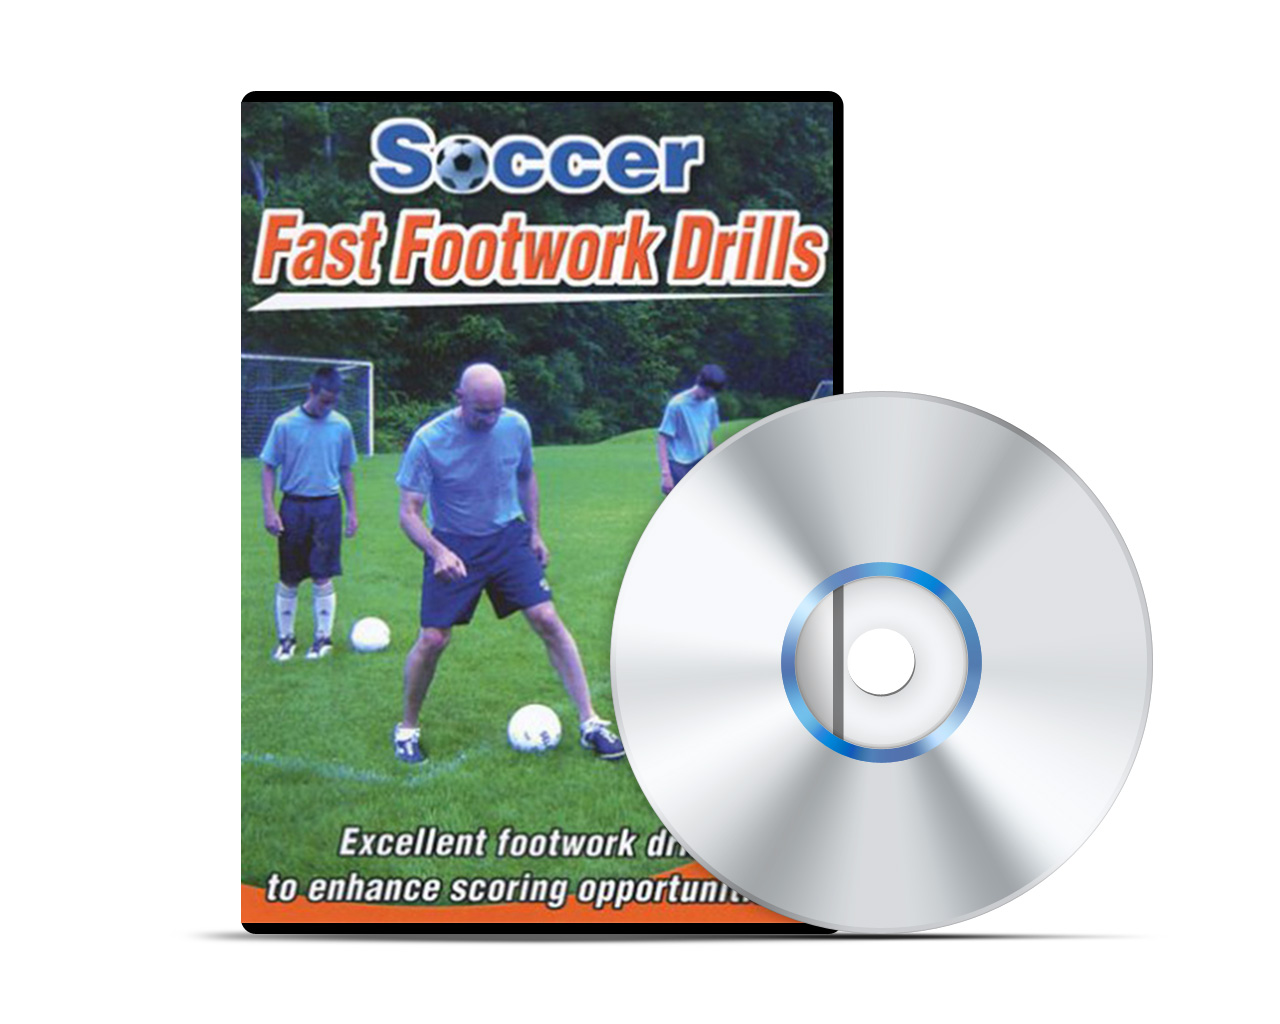 Fast footwork drils dvd.jpg